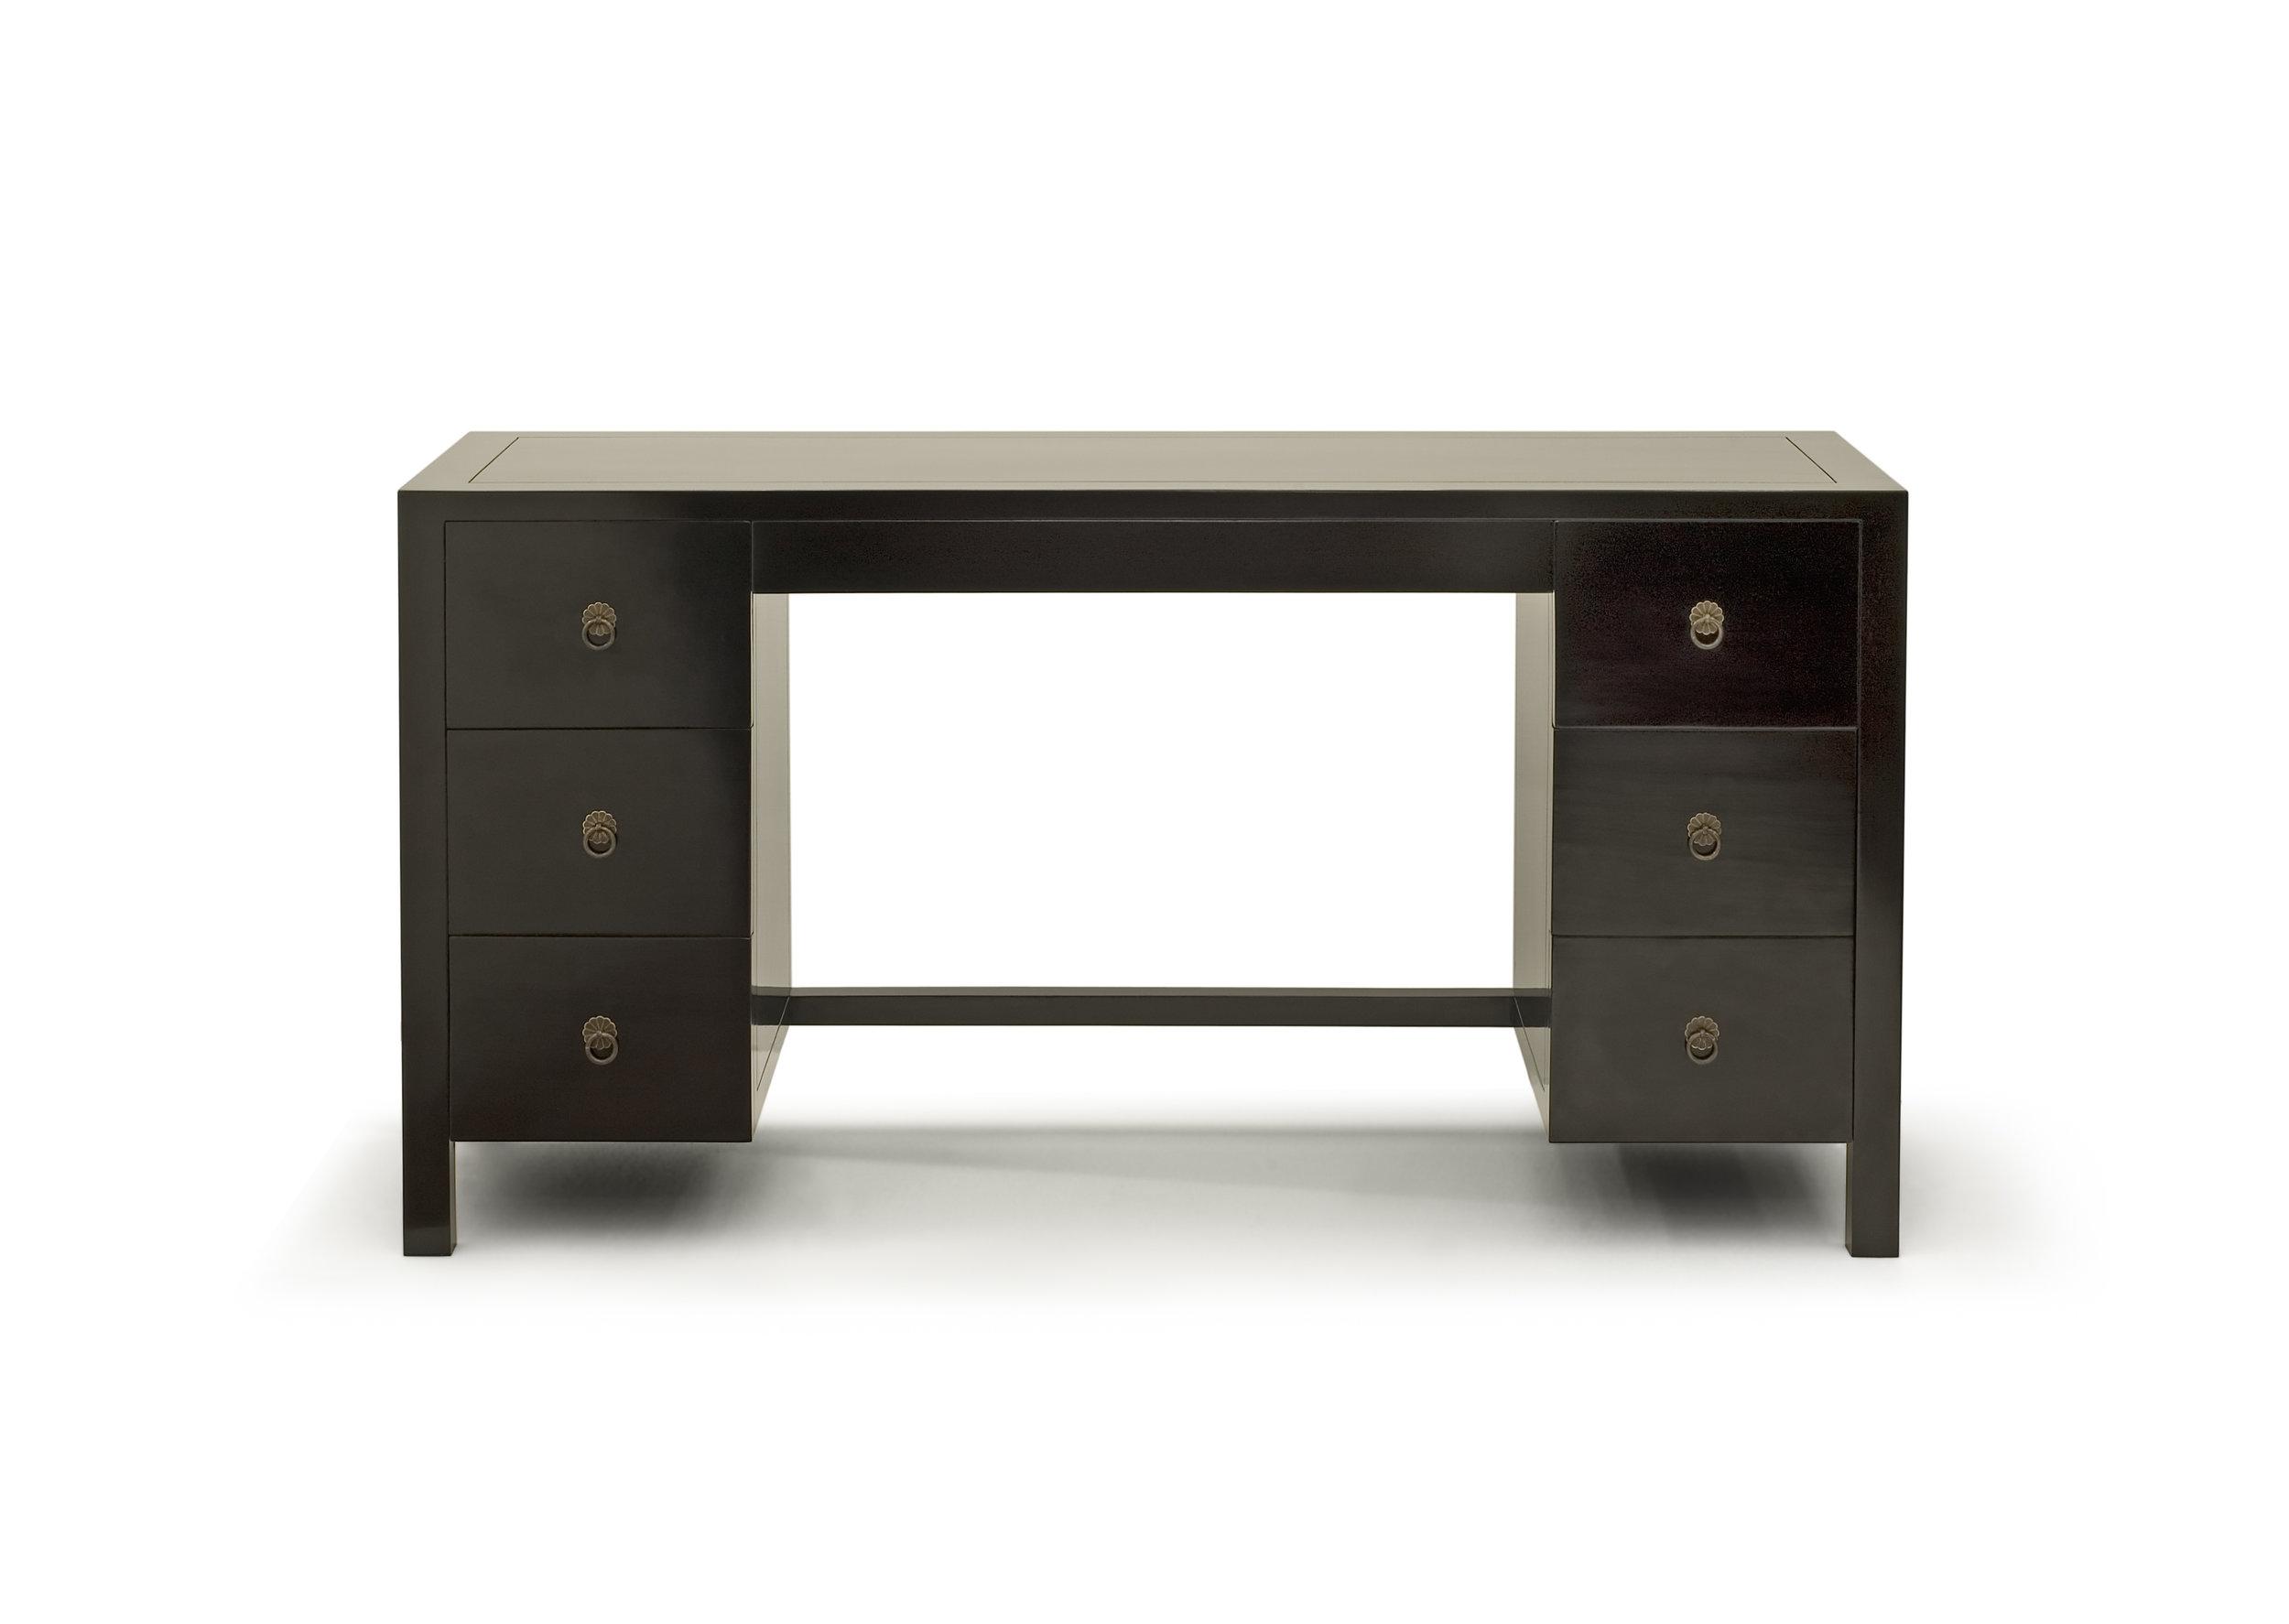 ....bespoke modern furniture   rosewood london : dressing table..特别定制现代家具   瑰丽伦敦酒店:梳妆台....